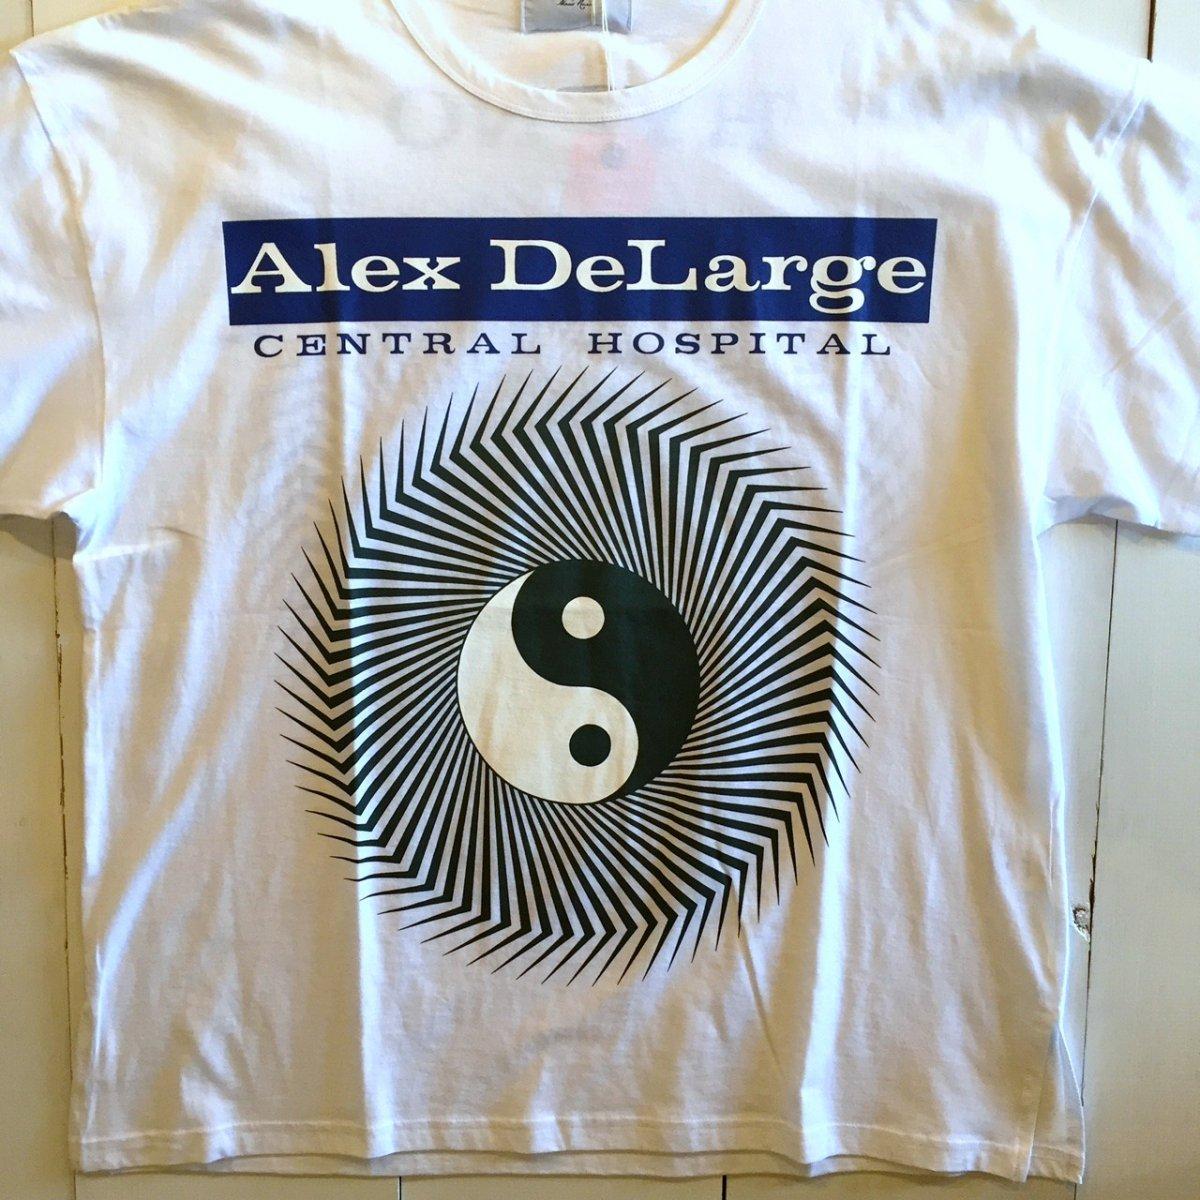 <img class='new_mark_img1' src='https://img.shop-pro.jp/img/new/icons3.gif' style='border:none;display:inline;margin:0px;padding:0px;width:auto;' />Black Weirdos  ブラック ウィドー / Tシャツ Alex DeLarge Hospital Tee